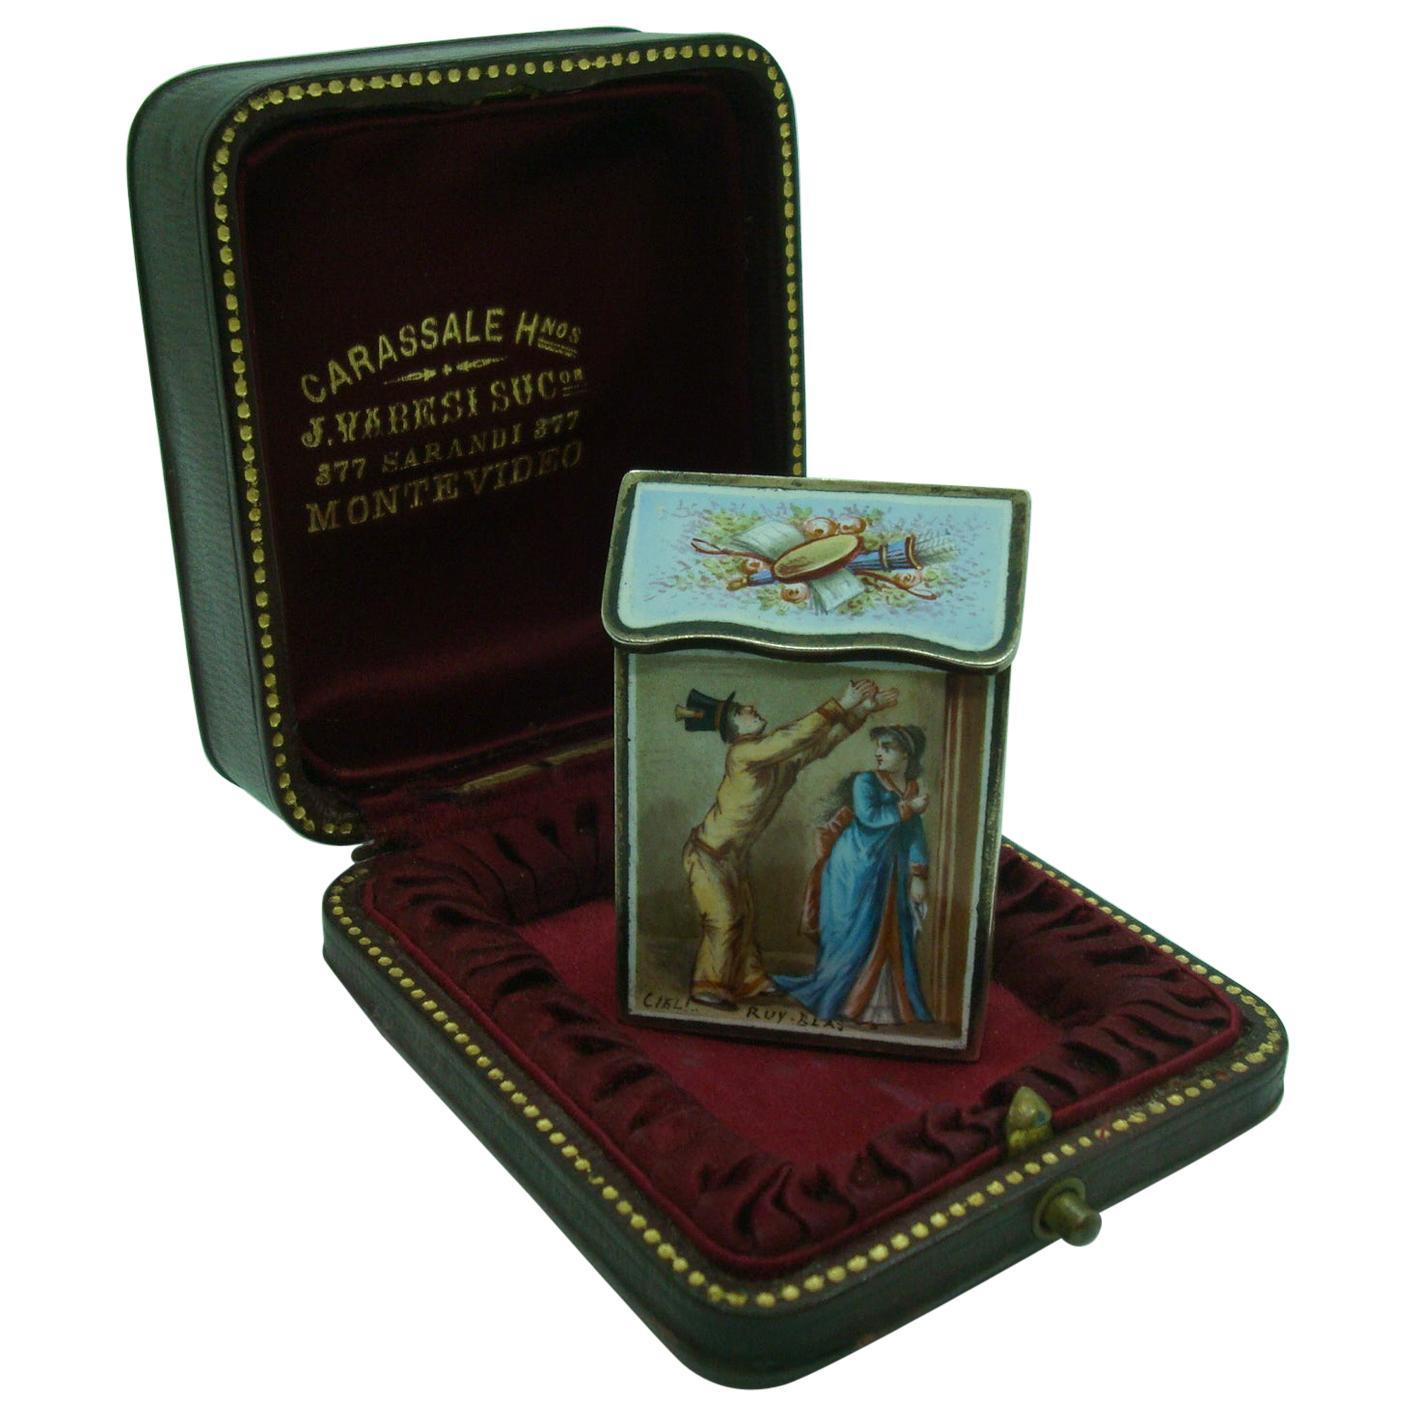 Antique French Silver and Enamel Vesta Case / Box, circa 1895